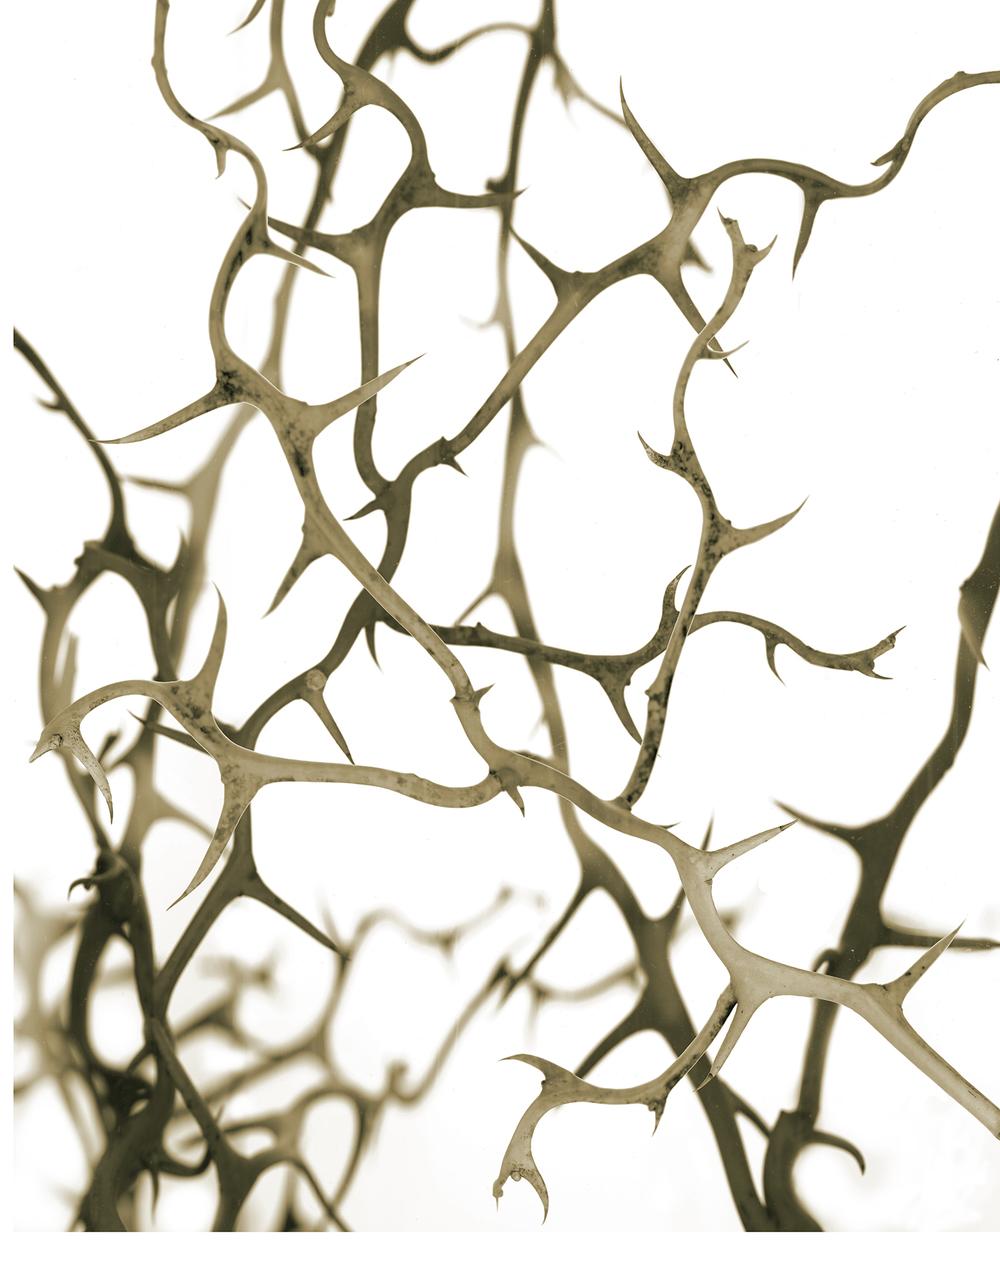 Thorns_2.jpg